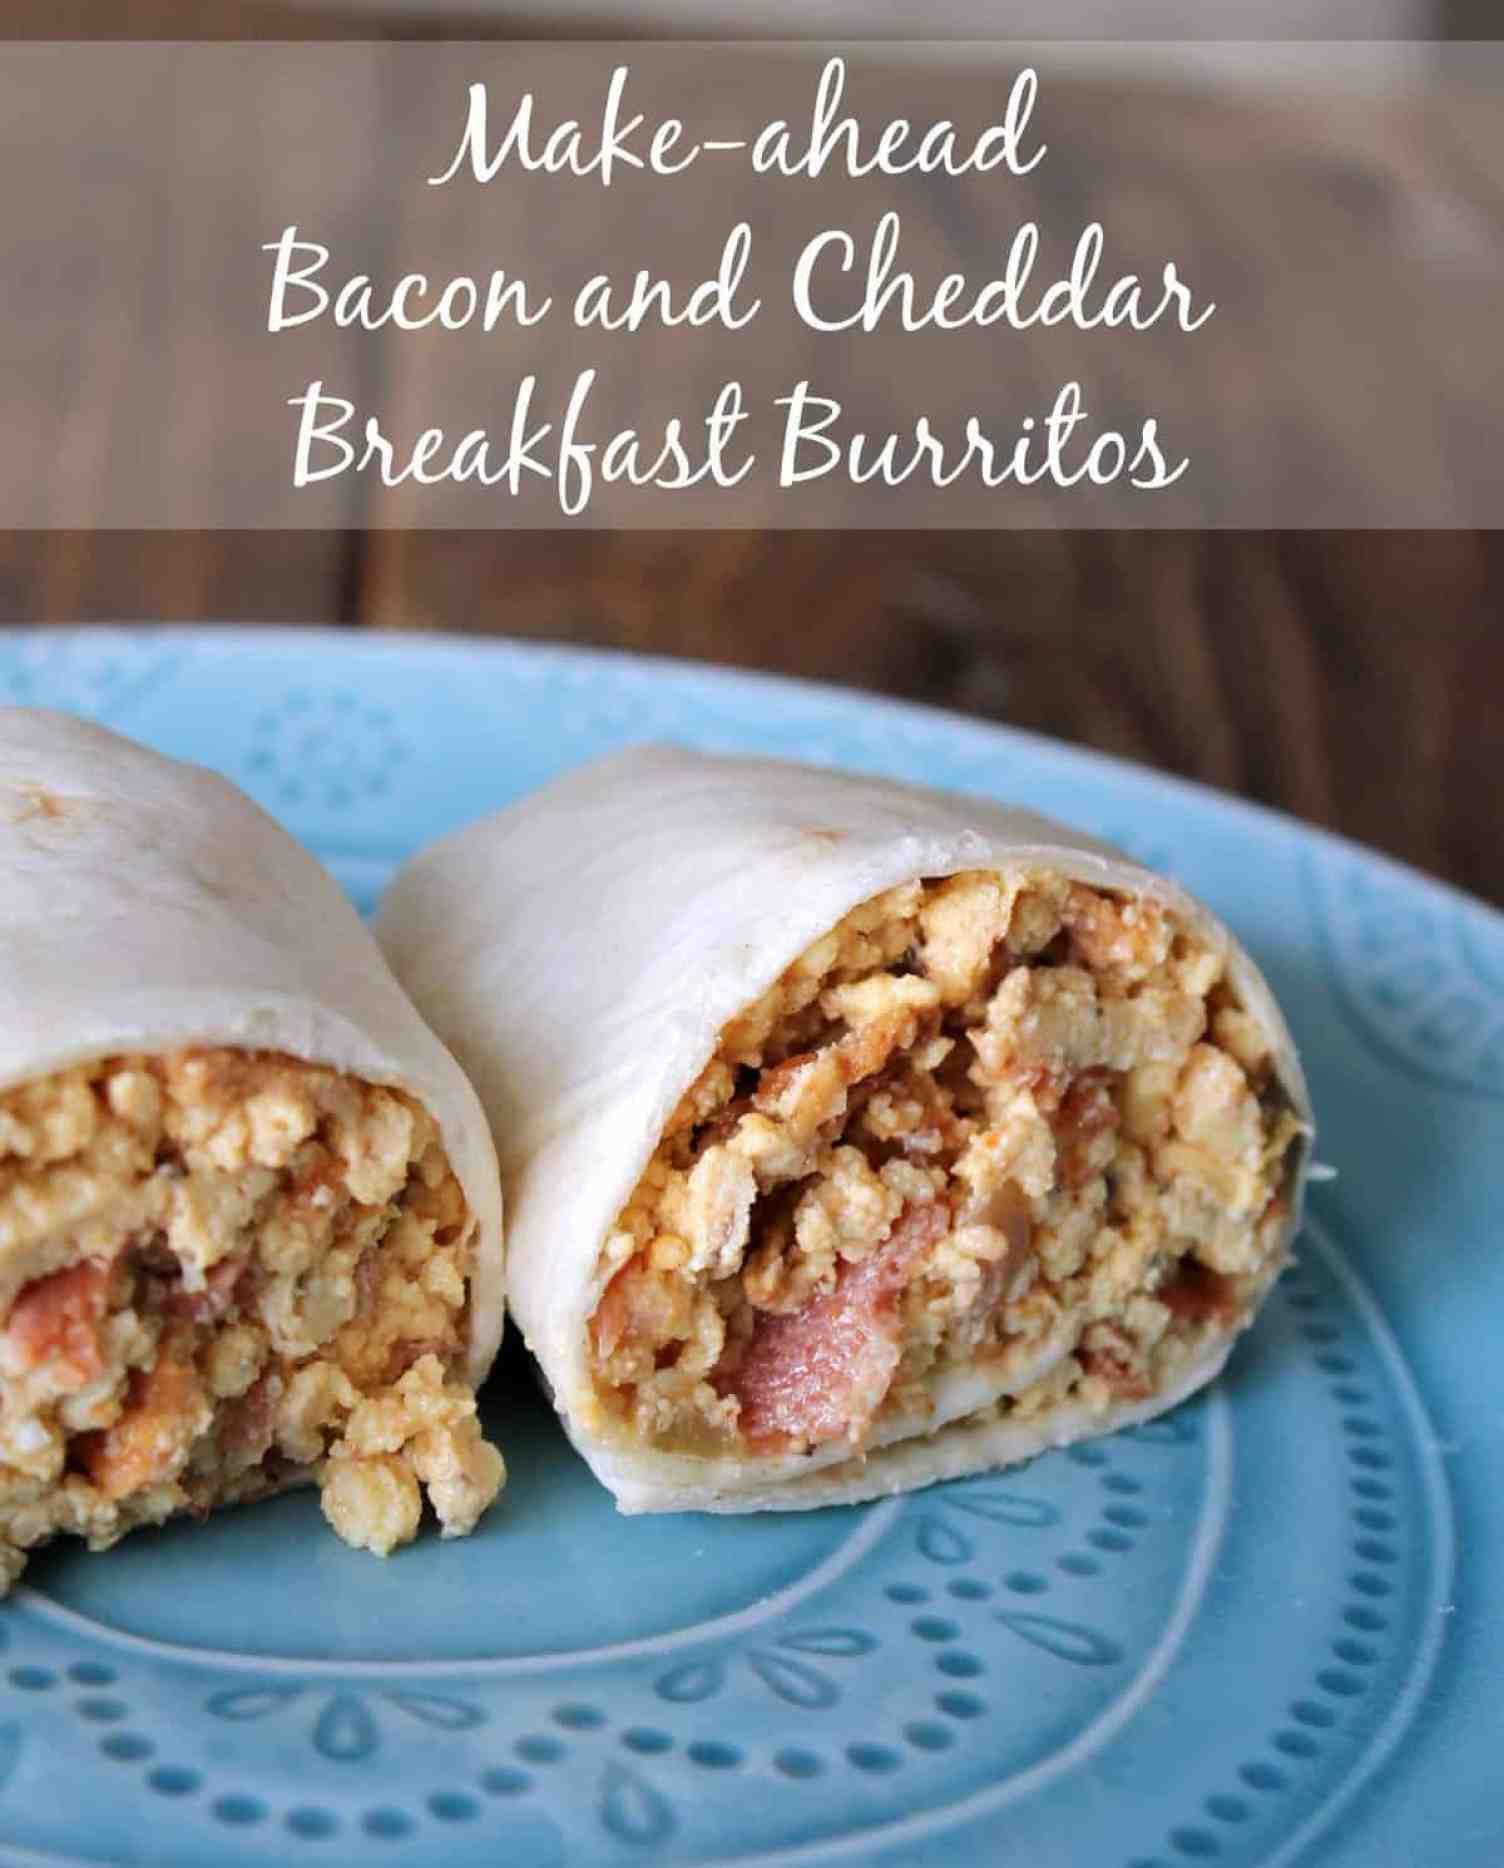 Make-ahead Bacon and Cheddar Breakfast Burrito